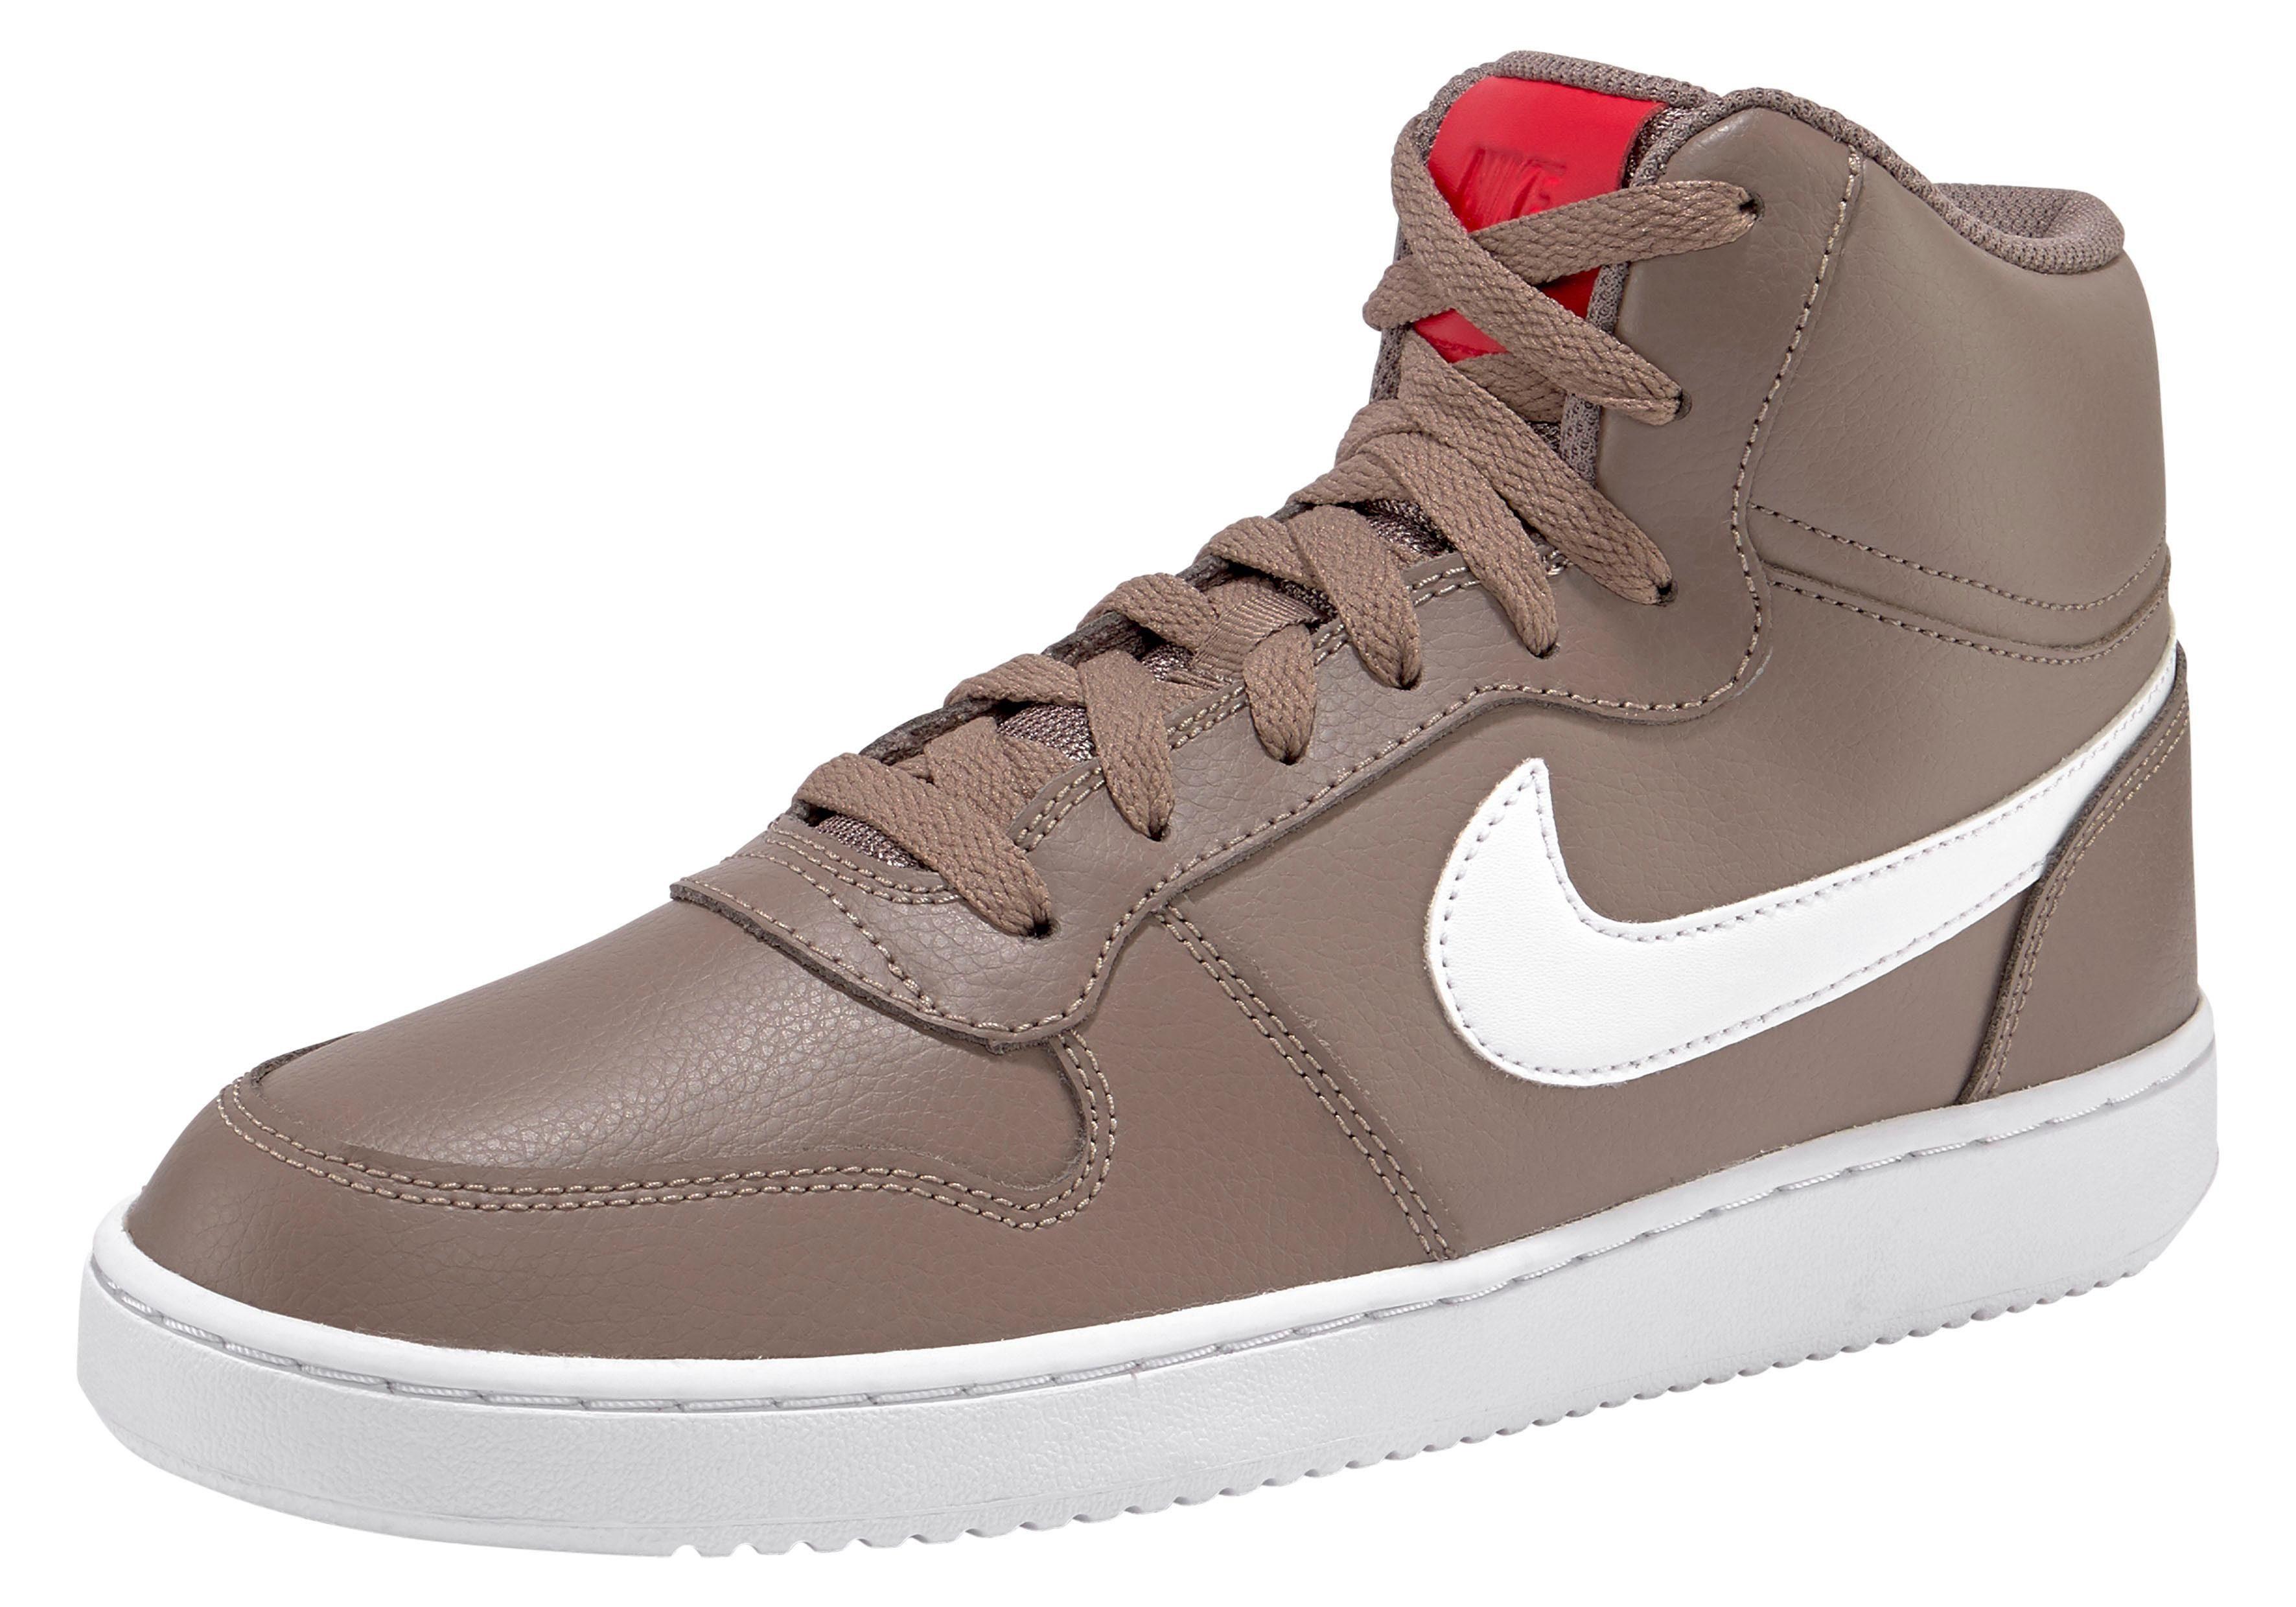 Nike Sportswear  Ebernon Mid  Sneaker kaufen   OTTO OTTO  5bddaa